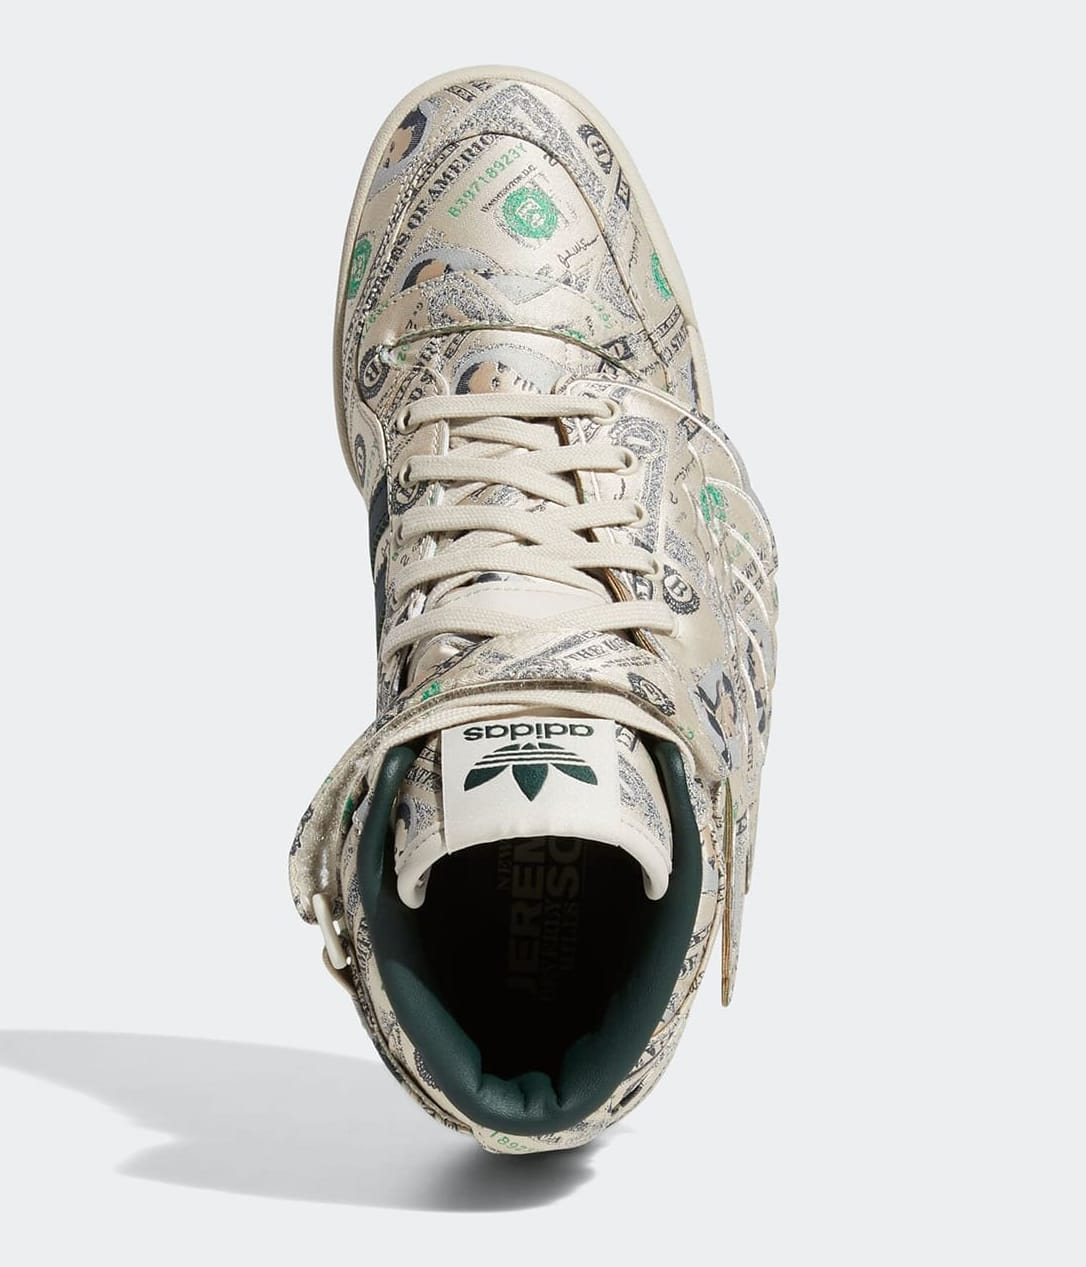 Jeremy Scott x Adidas Forum High Wings 'Money' Q46154 Top